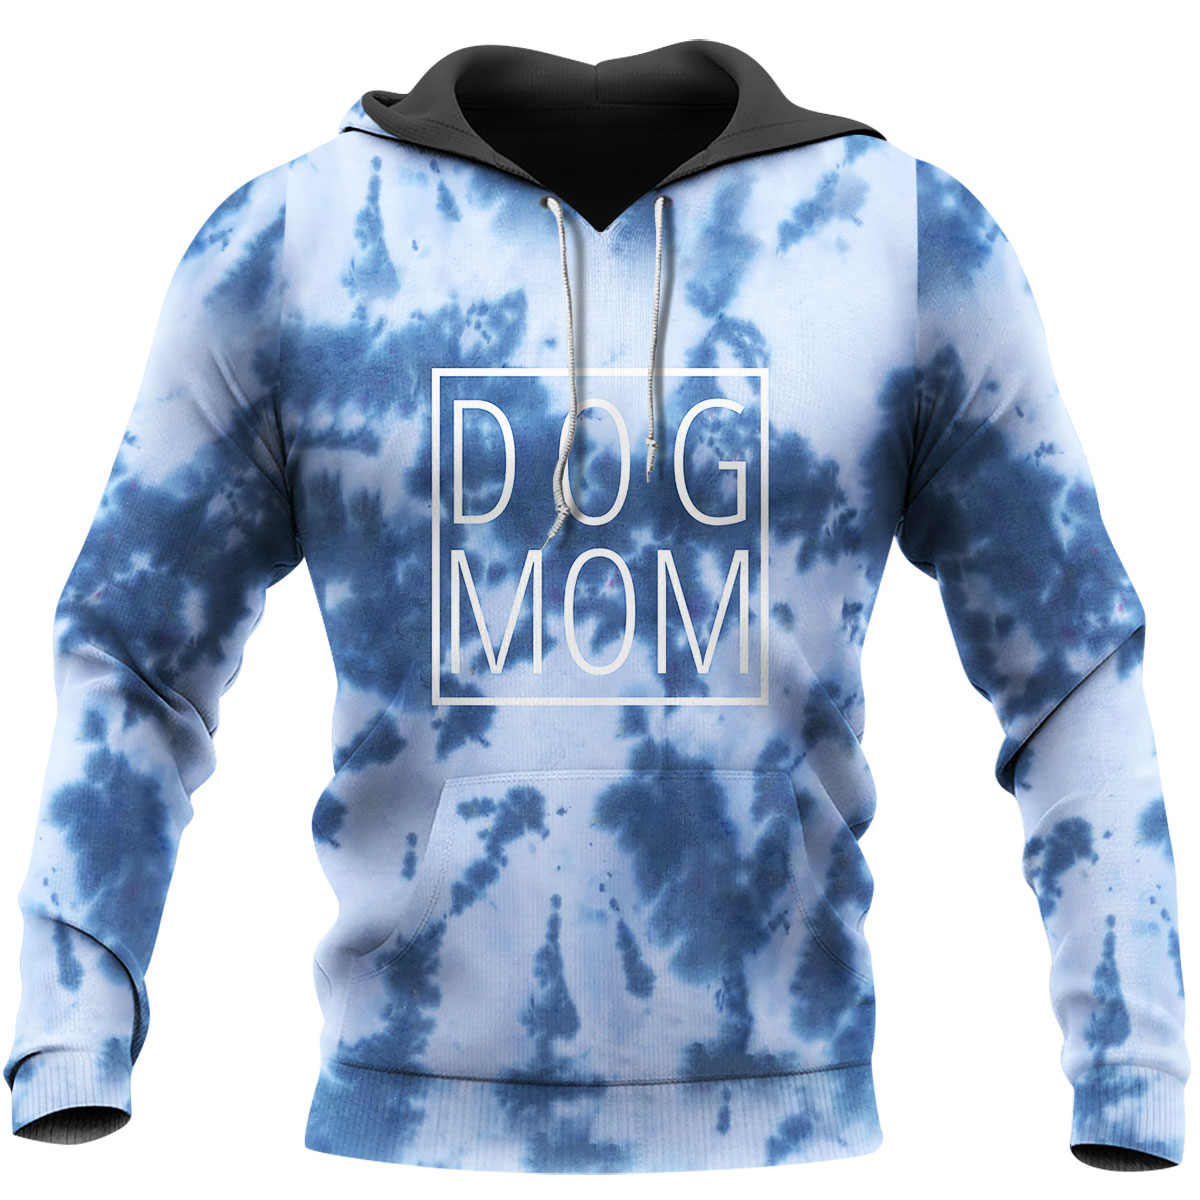 Dog Mom 3D All Over Printed Shirts